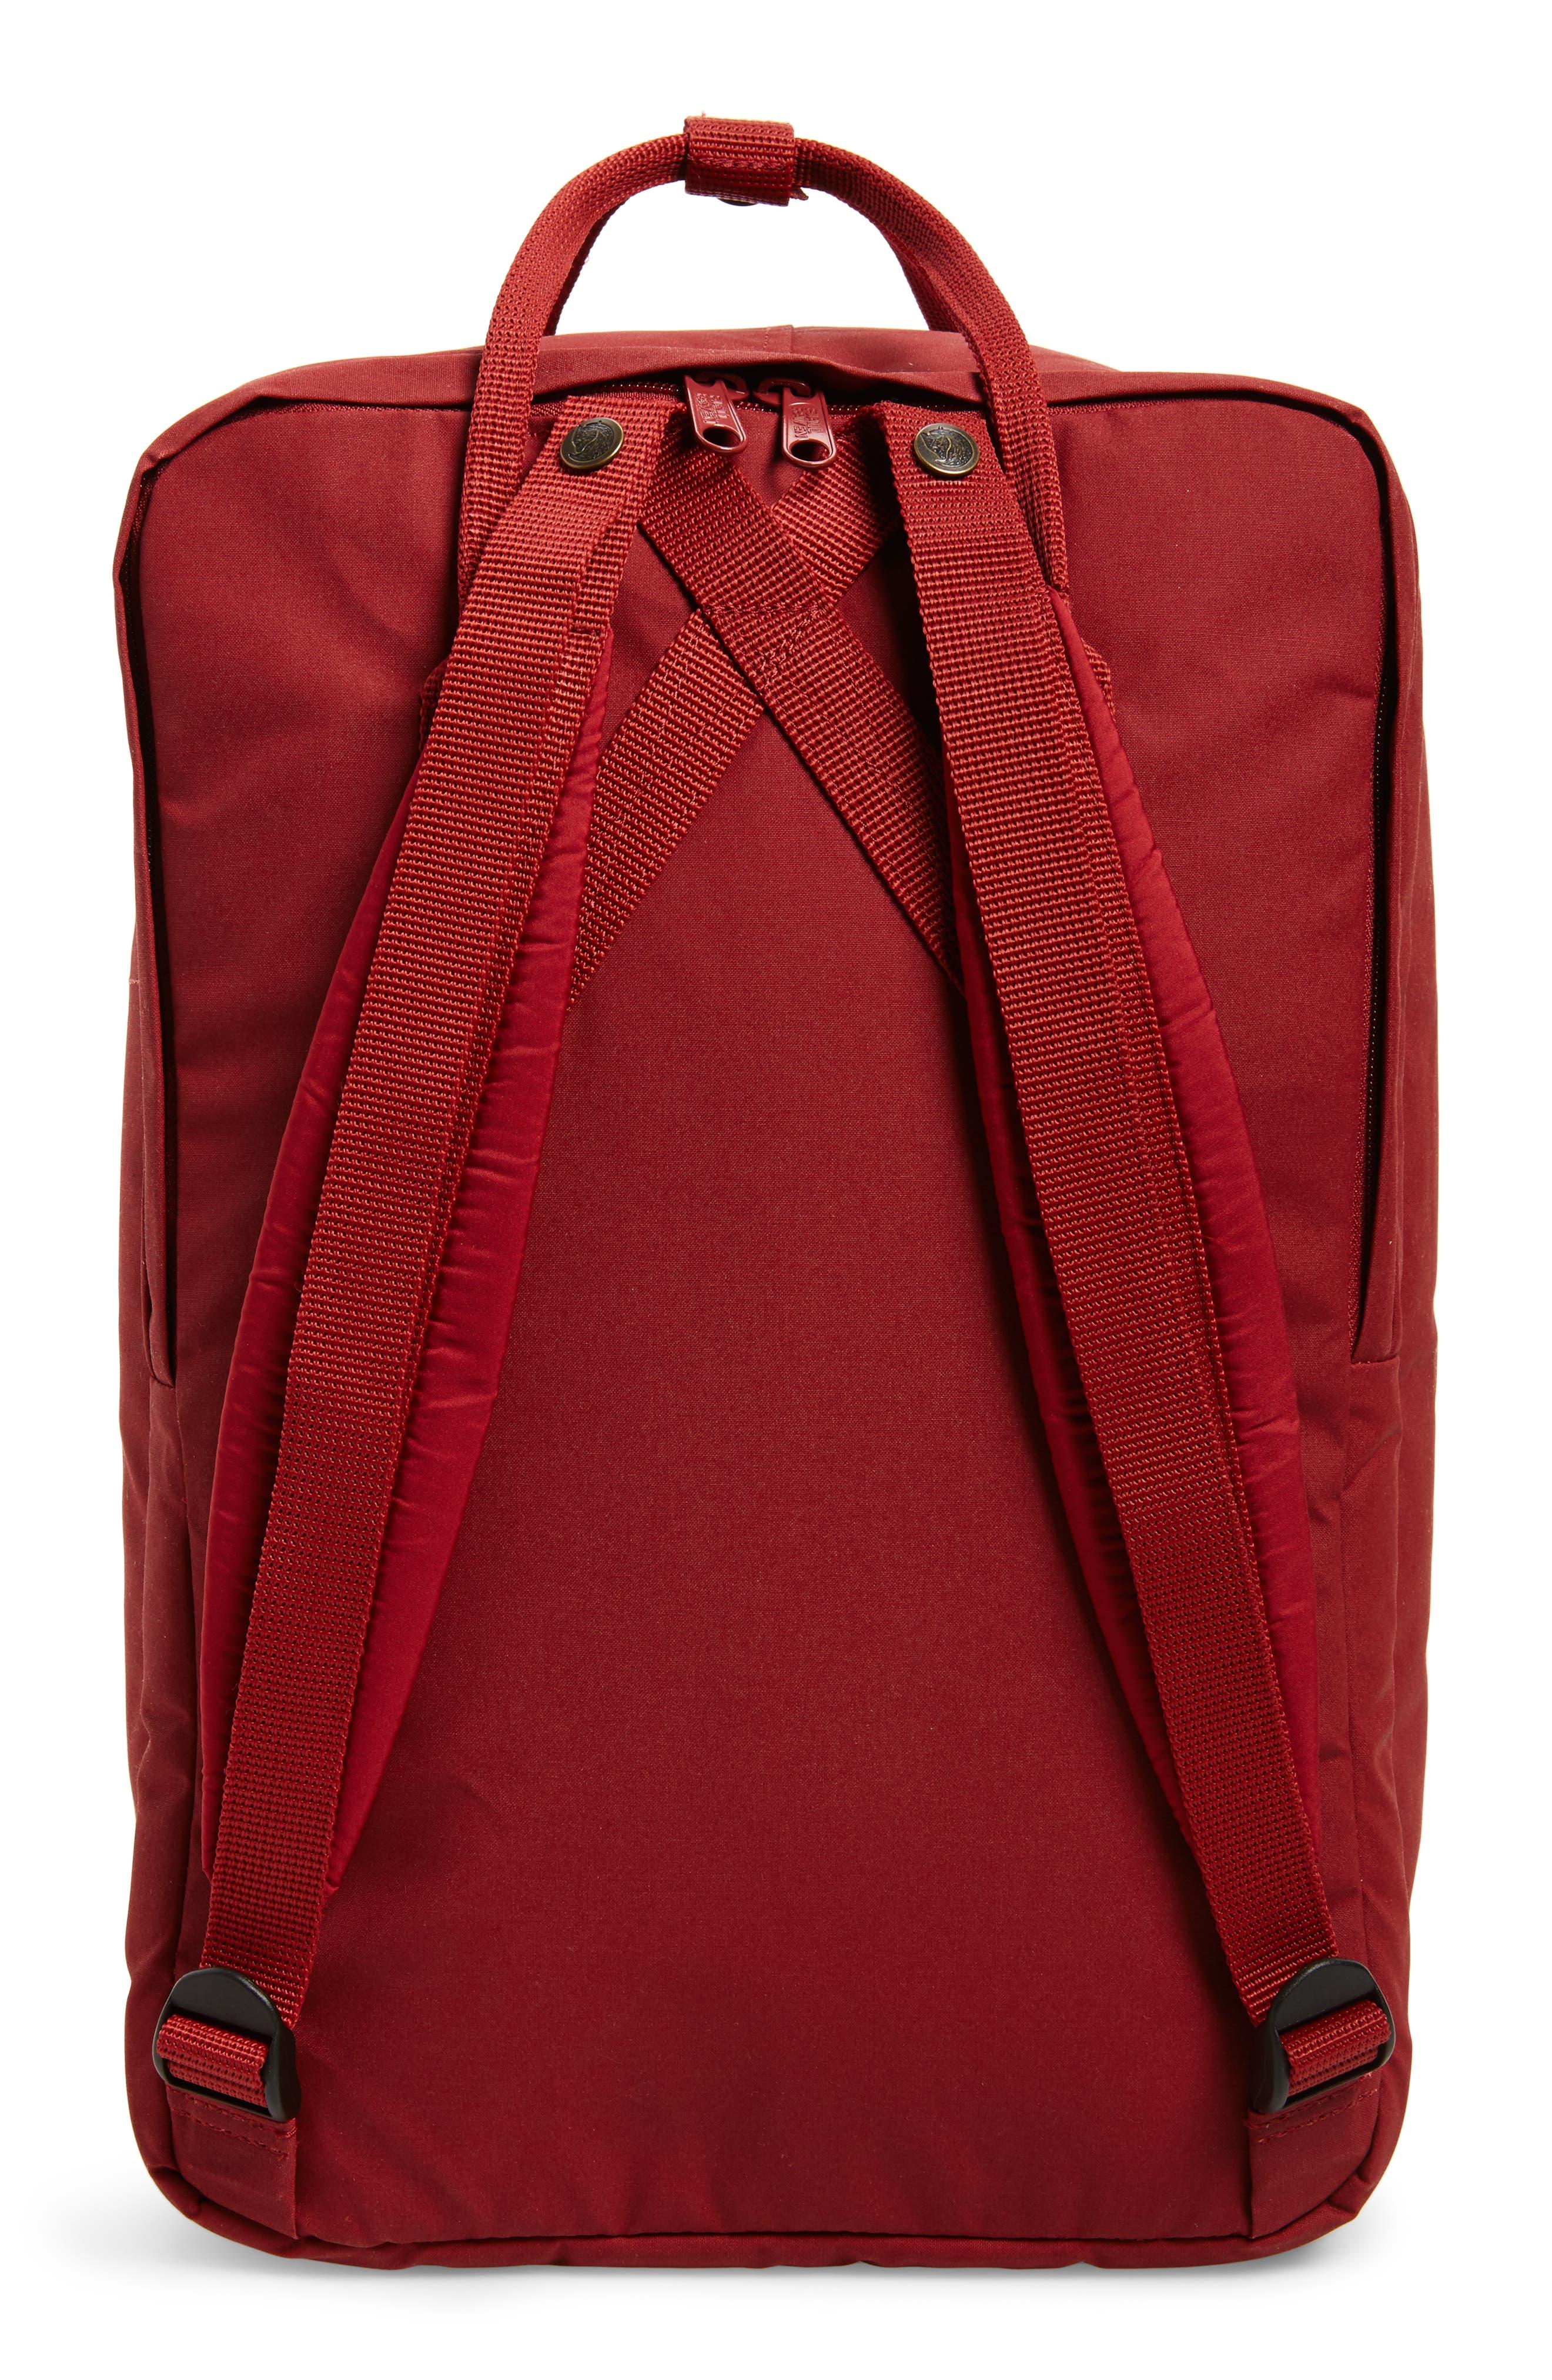 Alternate Image 3  - Fjällräven 'Kånken' Laptop Backpack (17 Inch)